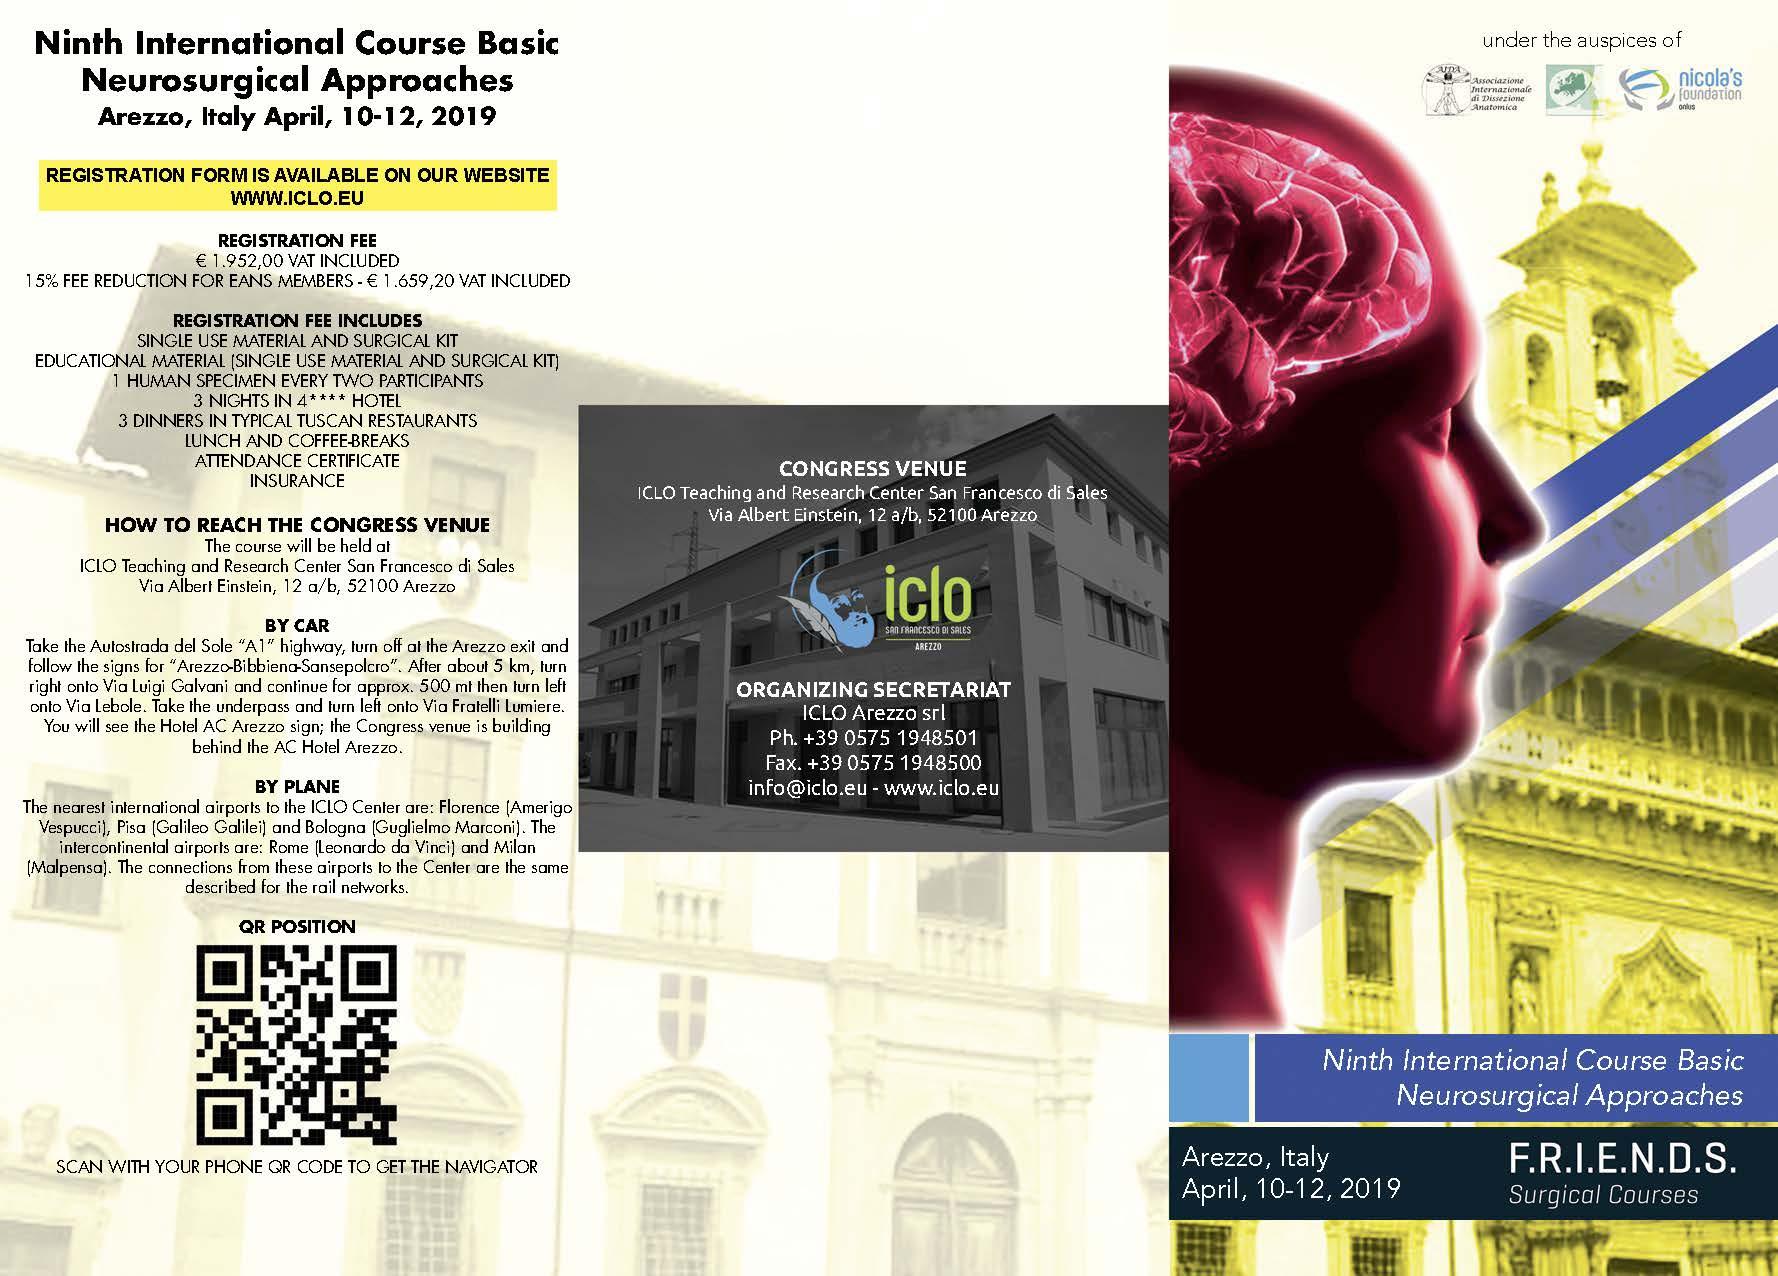 ProgrammaScientifico_2019_04_10-12[1]_Pagina_1